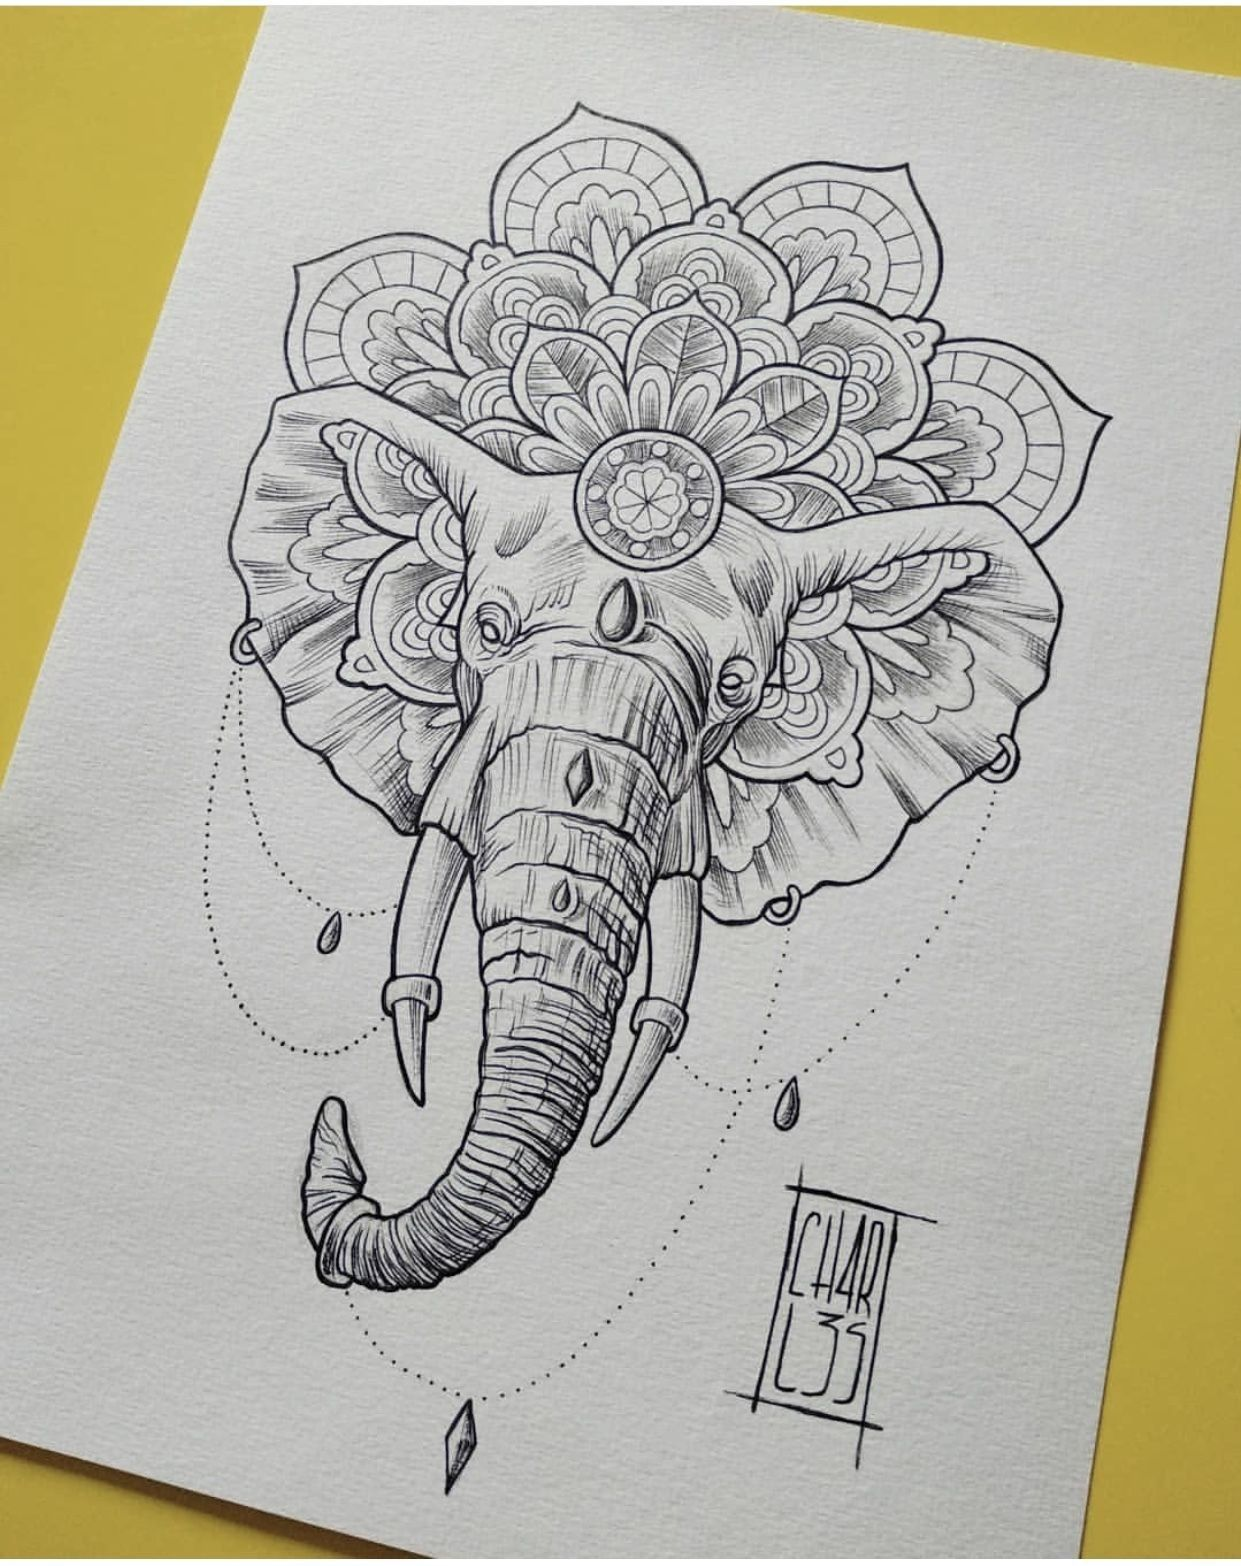 Neu Dessin Elephant Mandala Farbung Malvorlagen Malvorlagenkostenlos Designs Fur Elefantentattoos Mandala Tattoo Design Mandala Elefant Tattoo